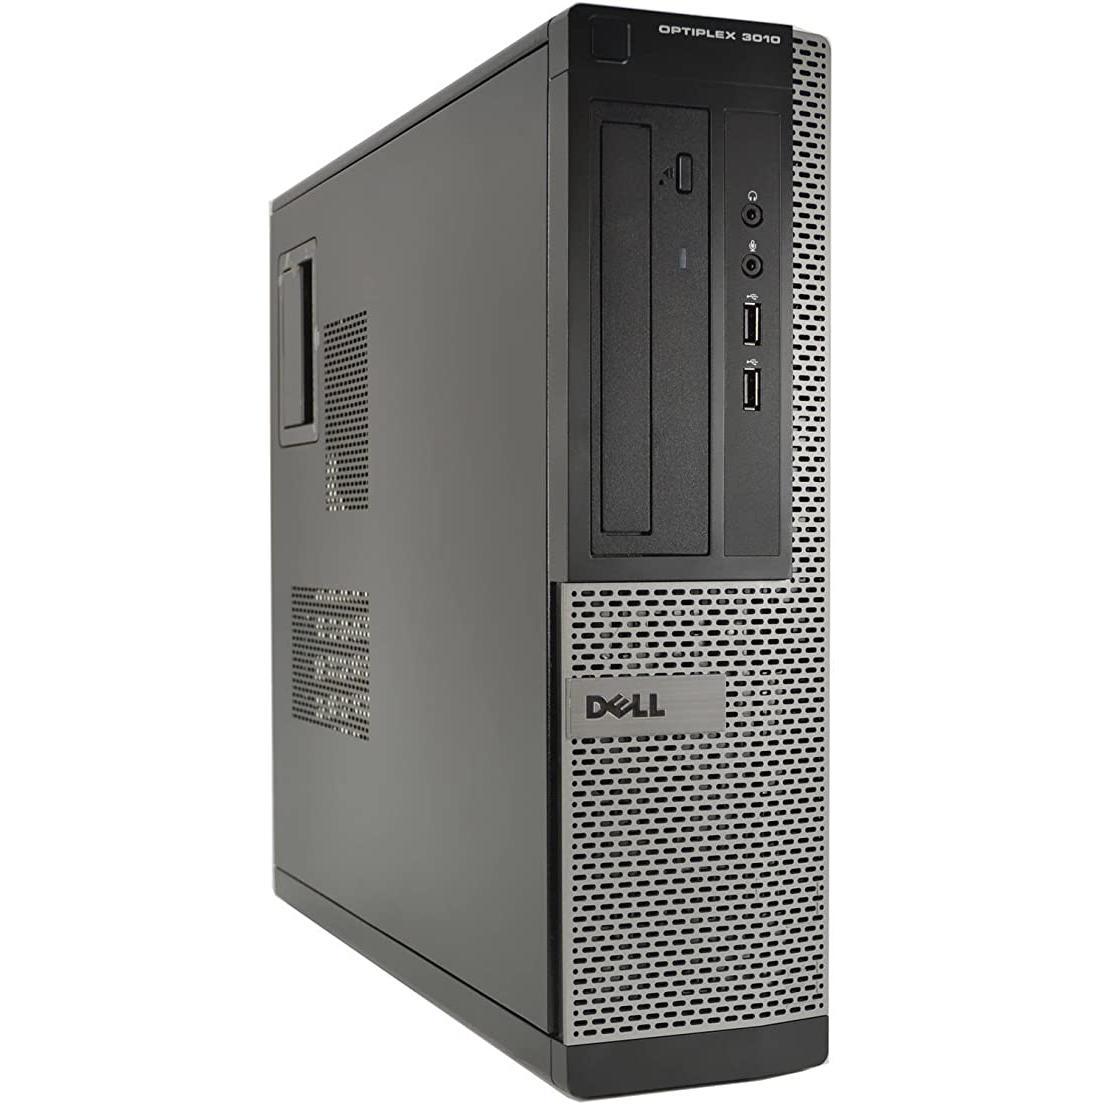 Dell OptiPlex 3010 DT Pentium 3,1 GHz - HDD 250 GB RAM 8 GB